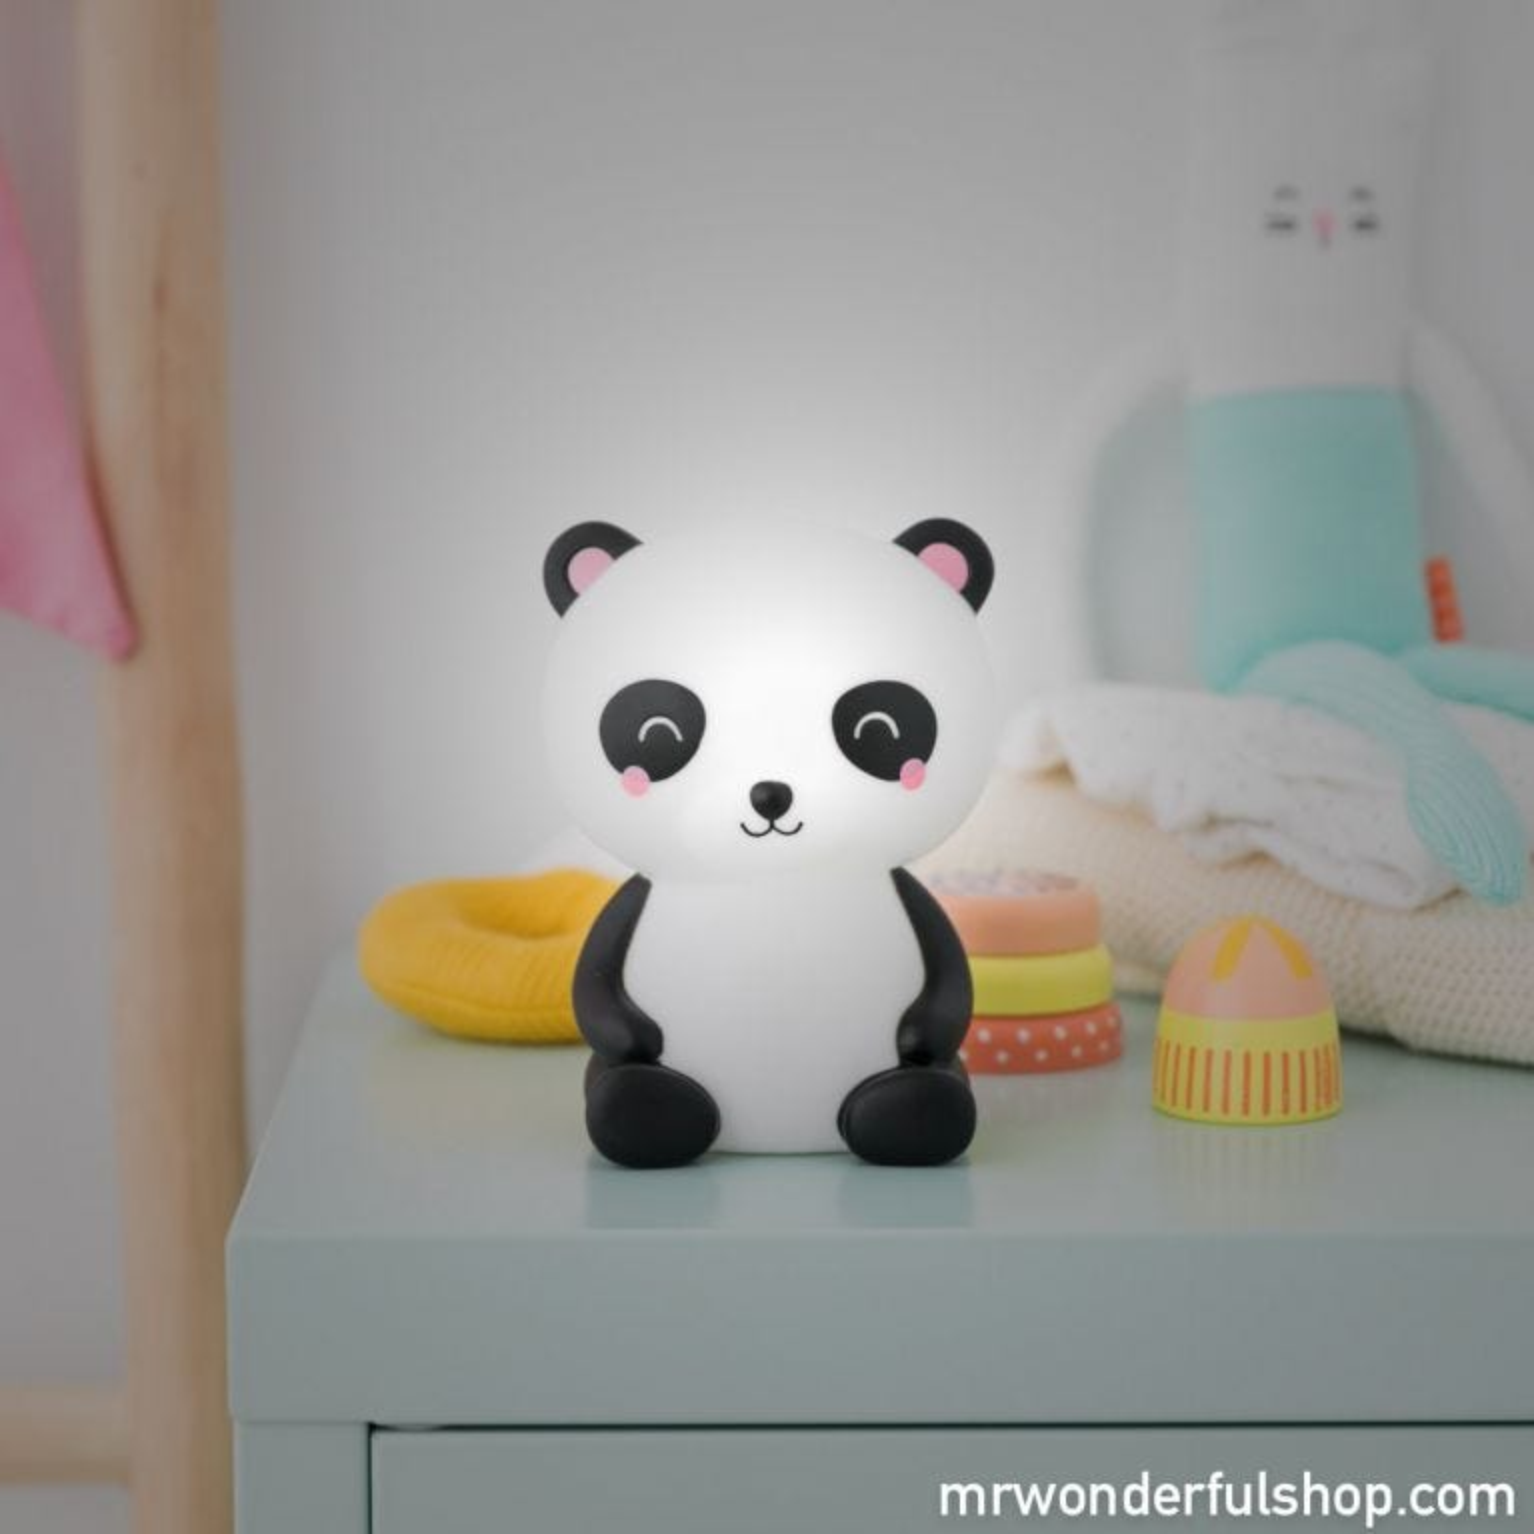 A magical light to give you sweet dreams - Panda bear